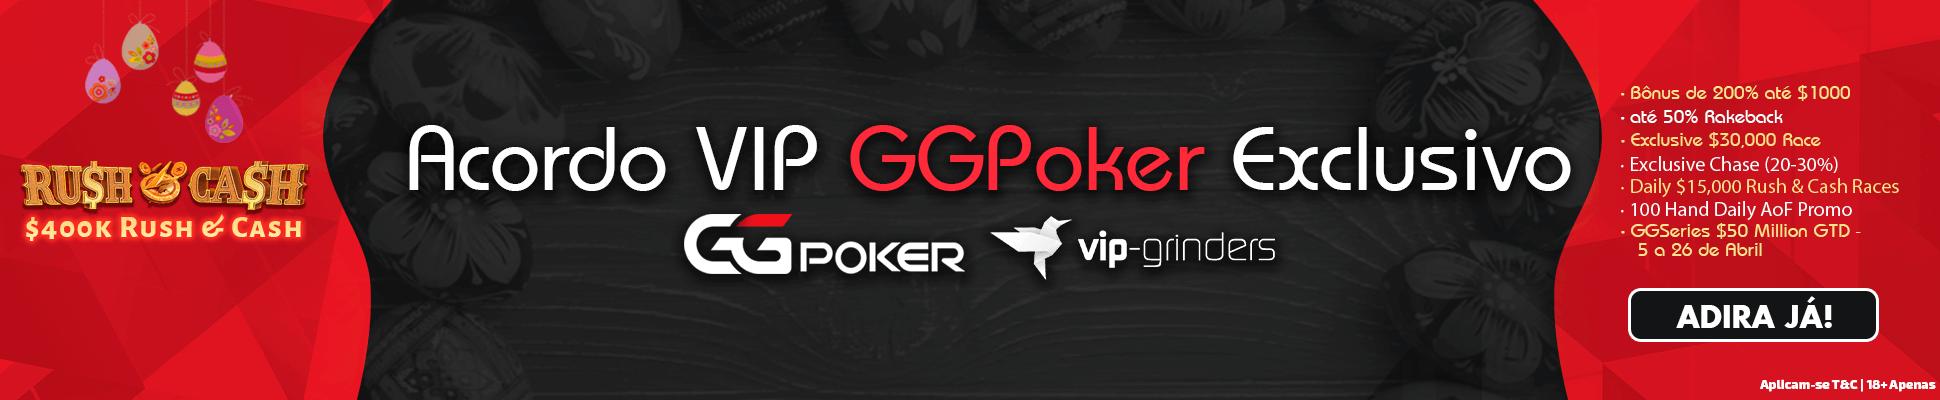 ggpoker-banner-april-2020-adj